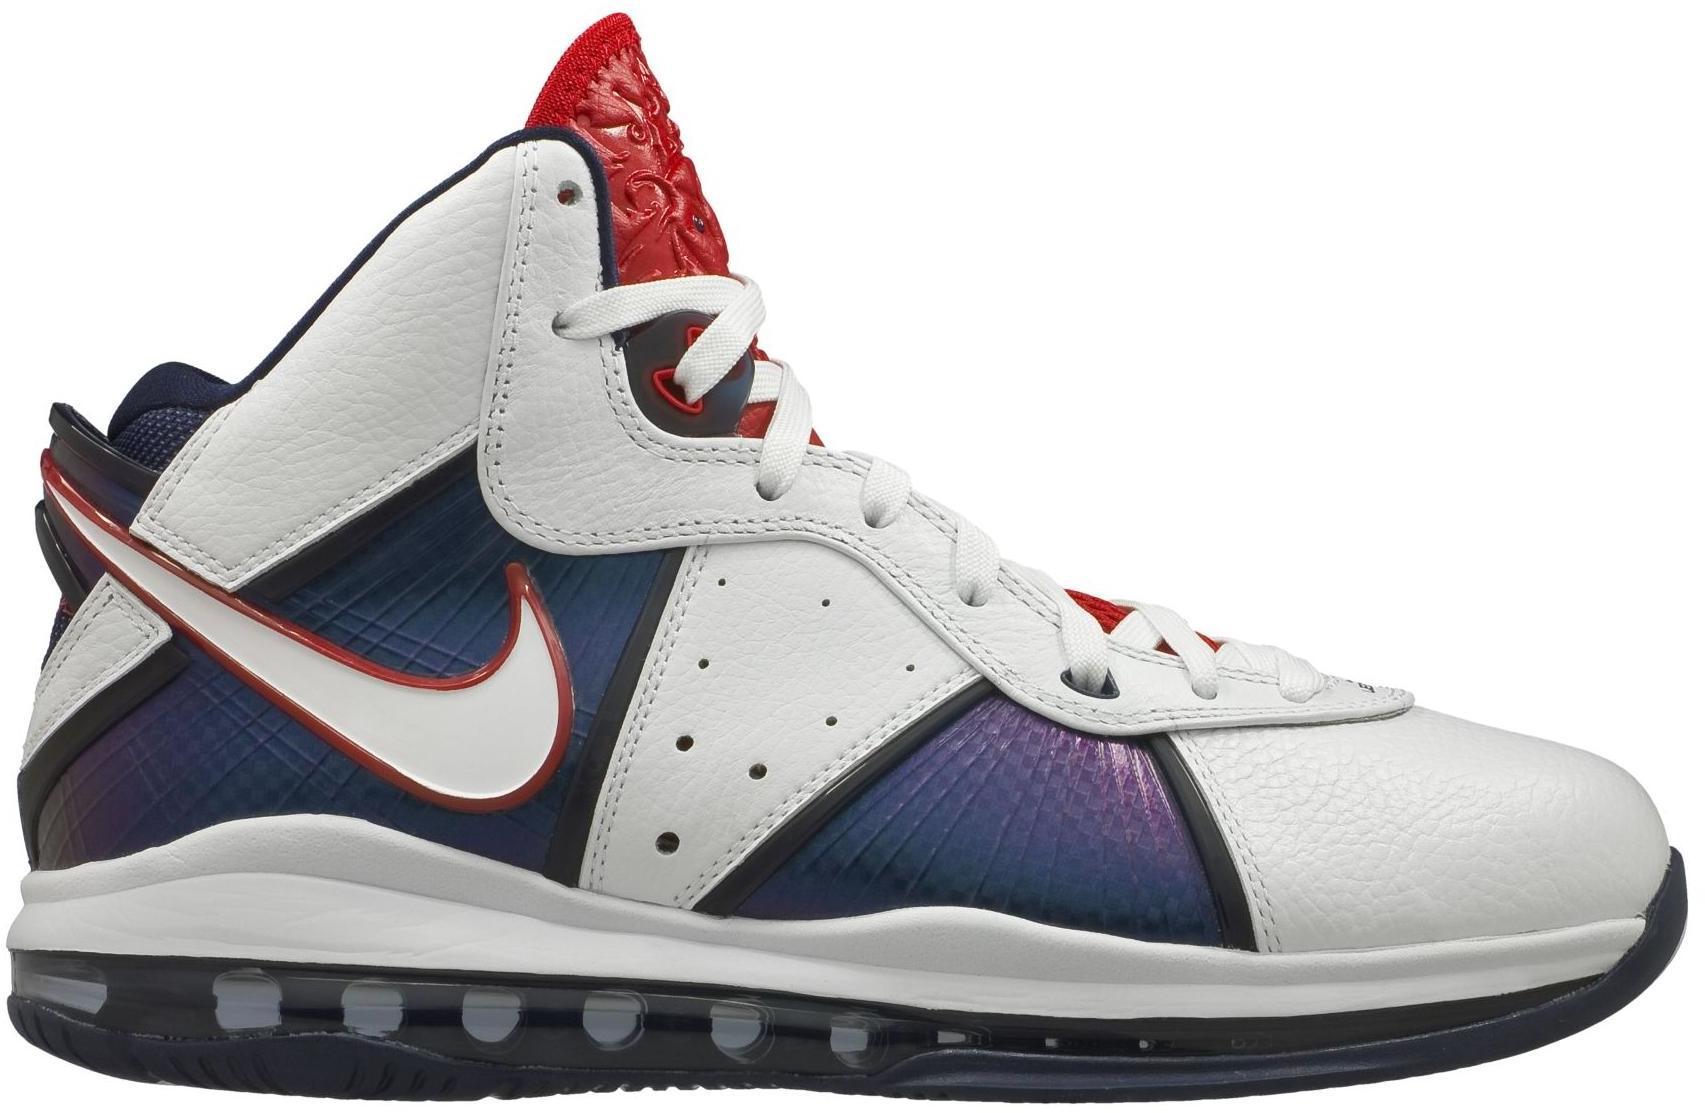 Nike LeBron 8 Veterans Day - 417098-100